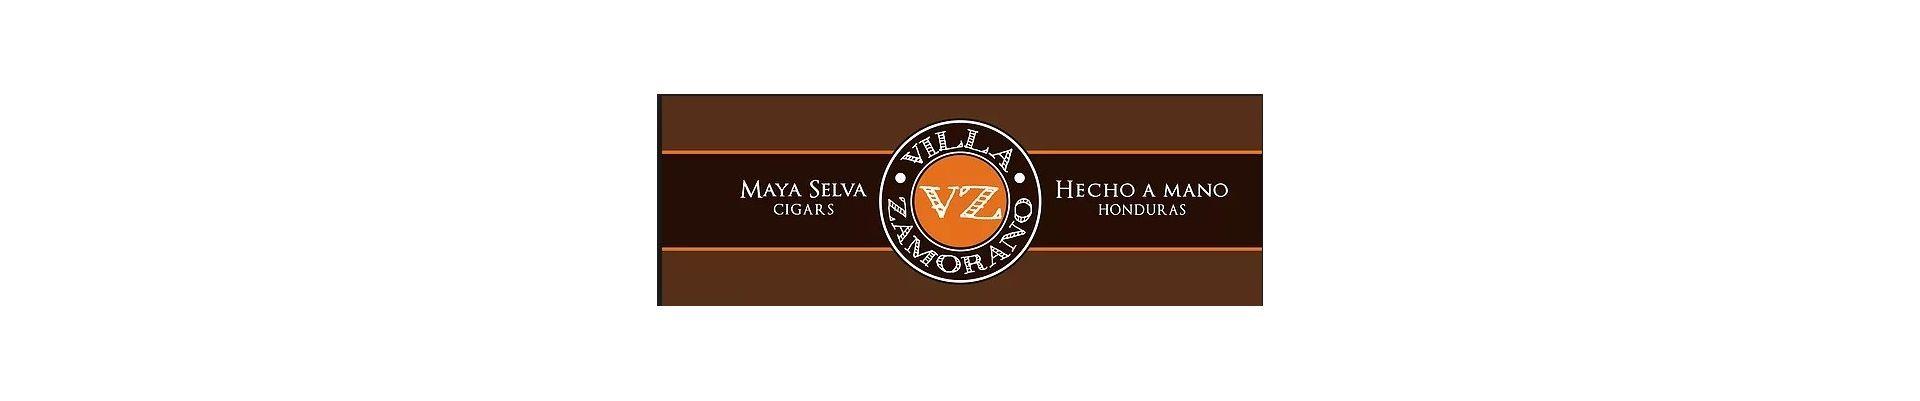 Trabucuri Villa Zamorano Magazin trabucuri ieftine Villa Zamorano pret